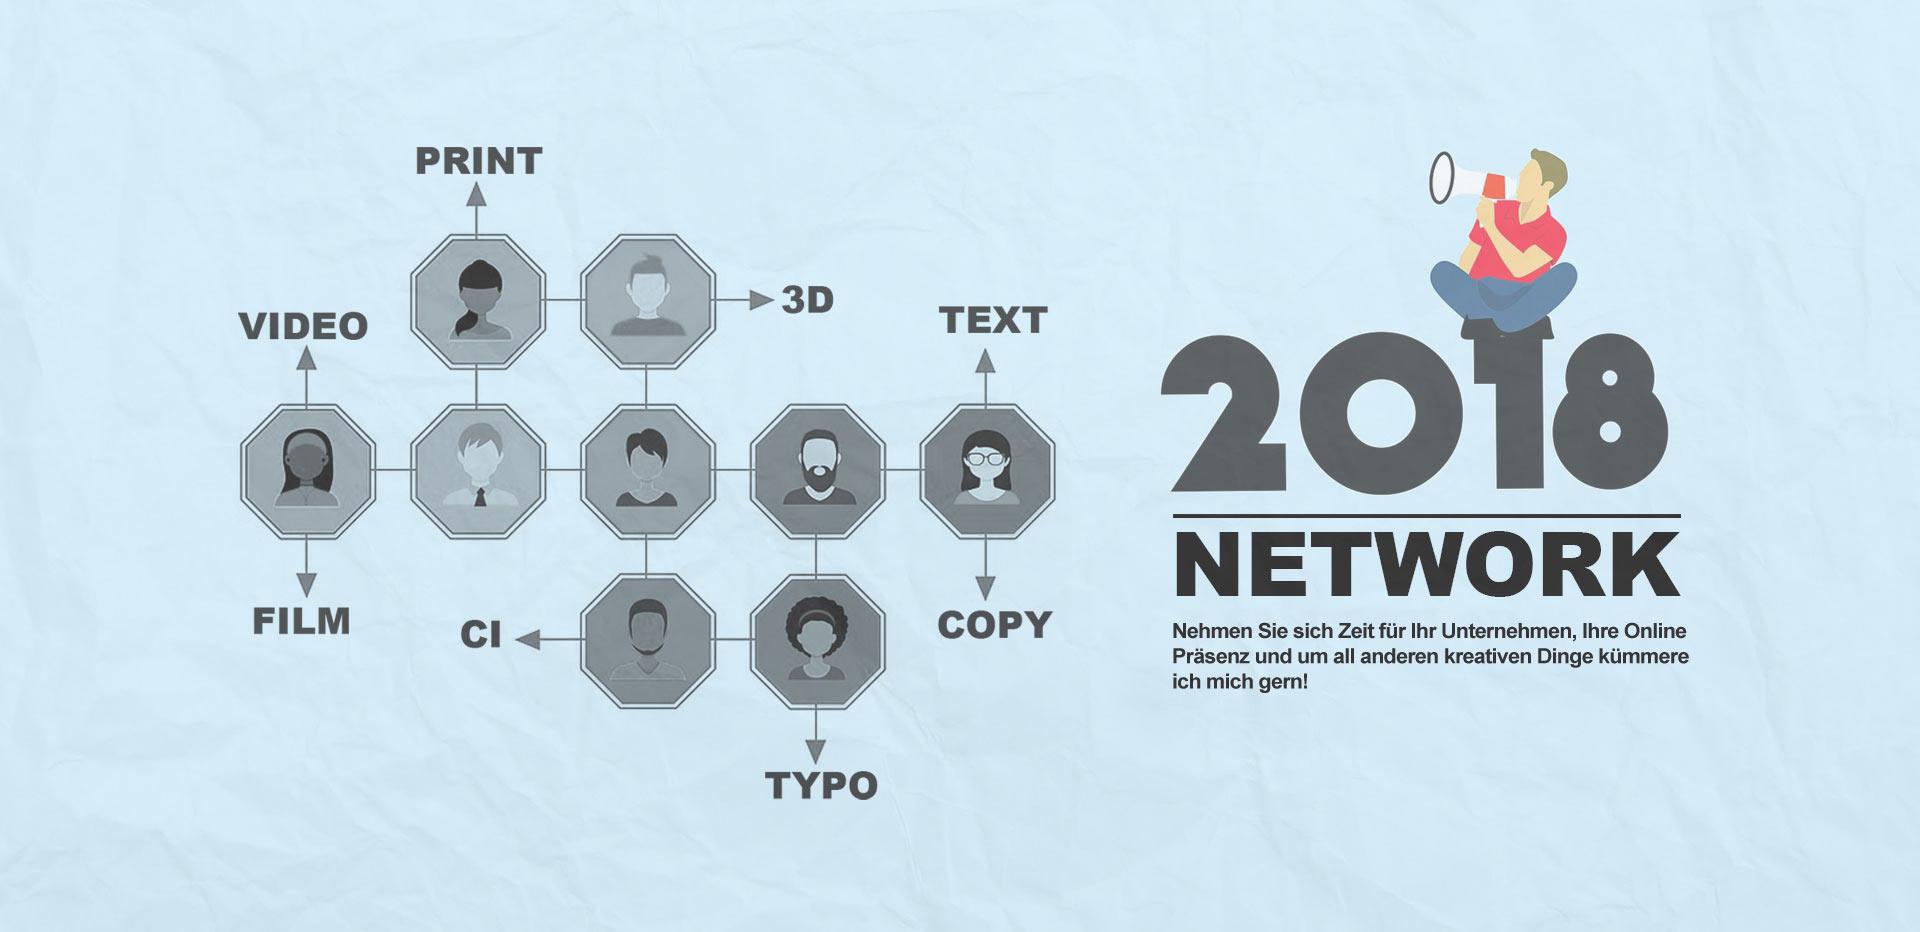 Start Network